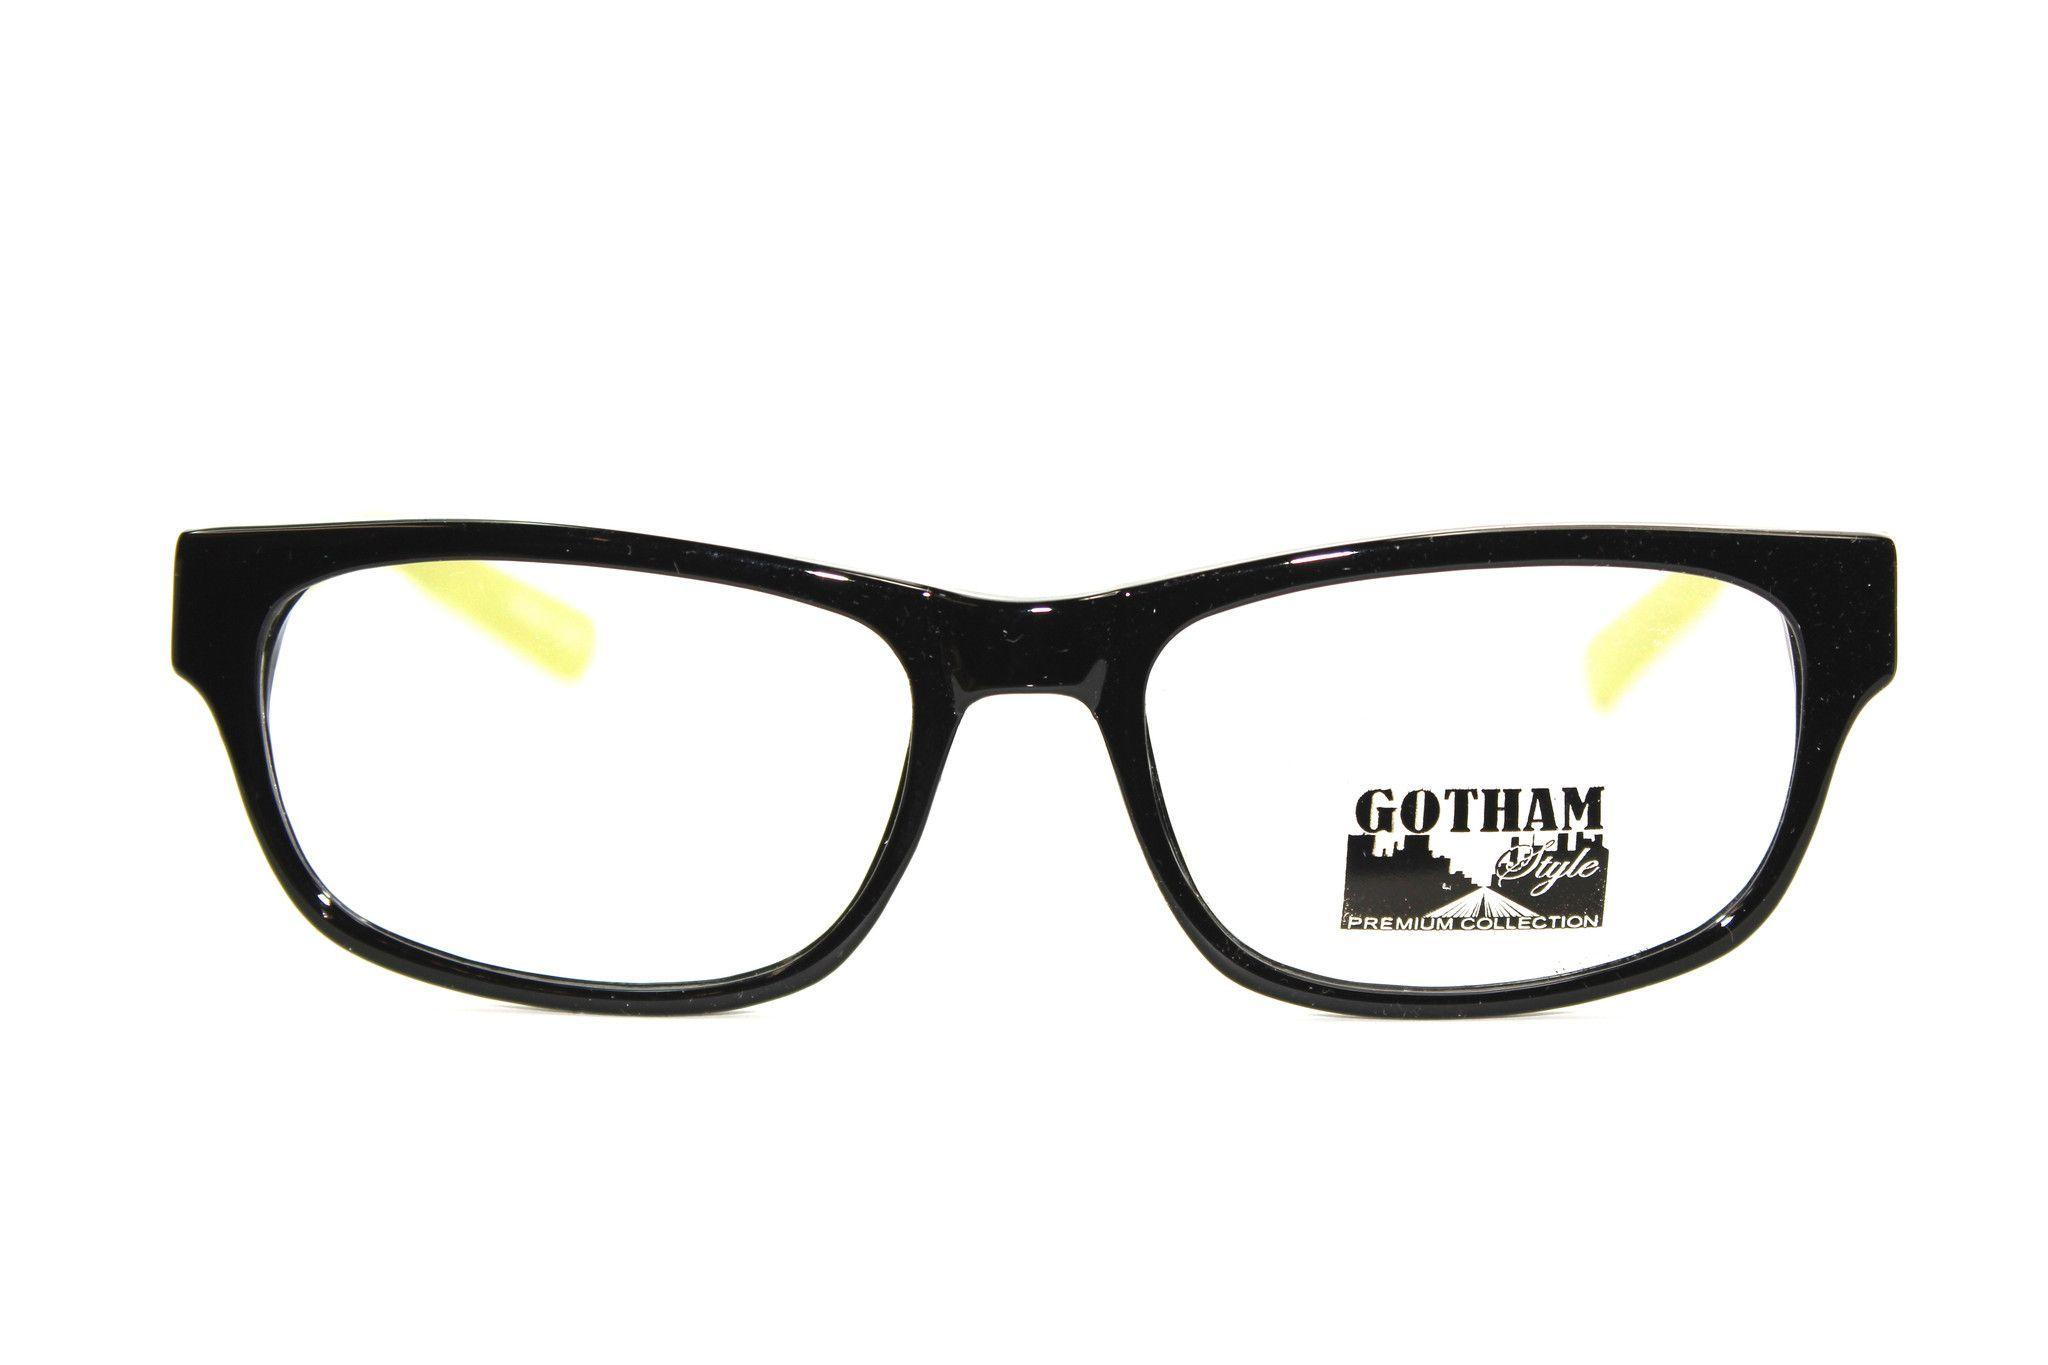 Gotham #202 Black/Yellow (51mm)